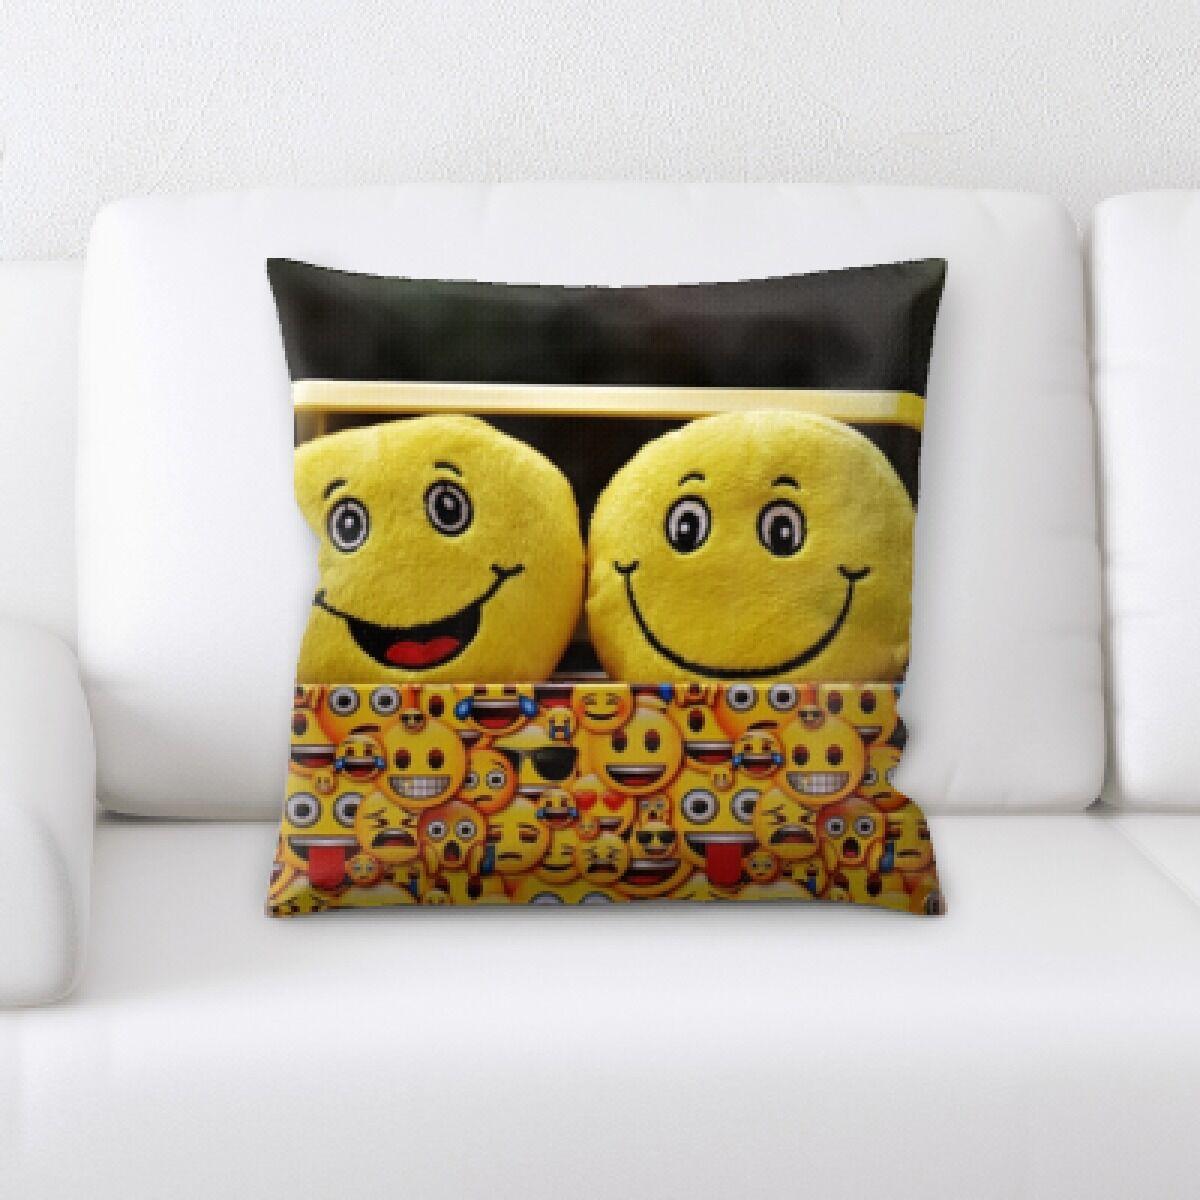 Blanton Joy Feelings Happy Faces In a Box Throw Pillow